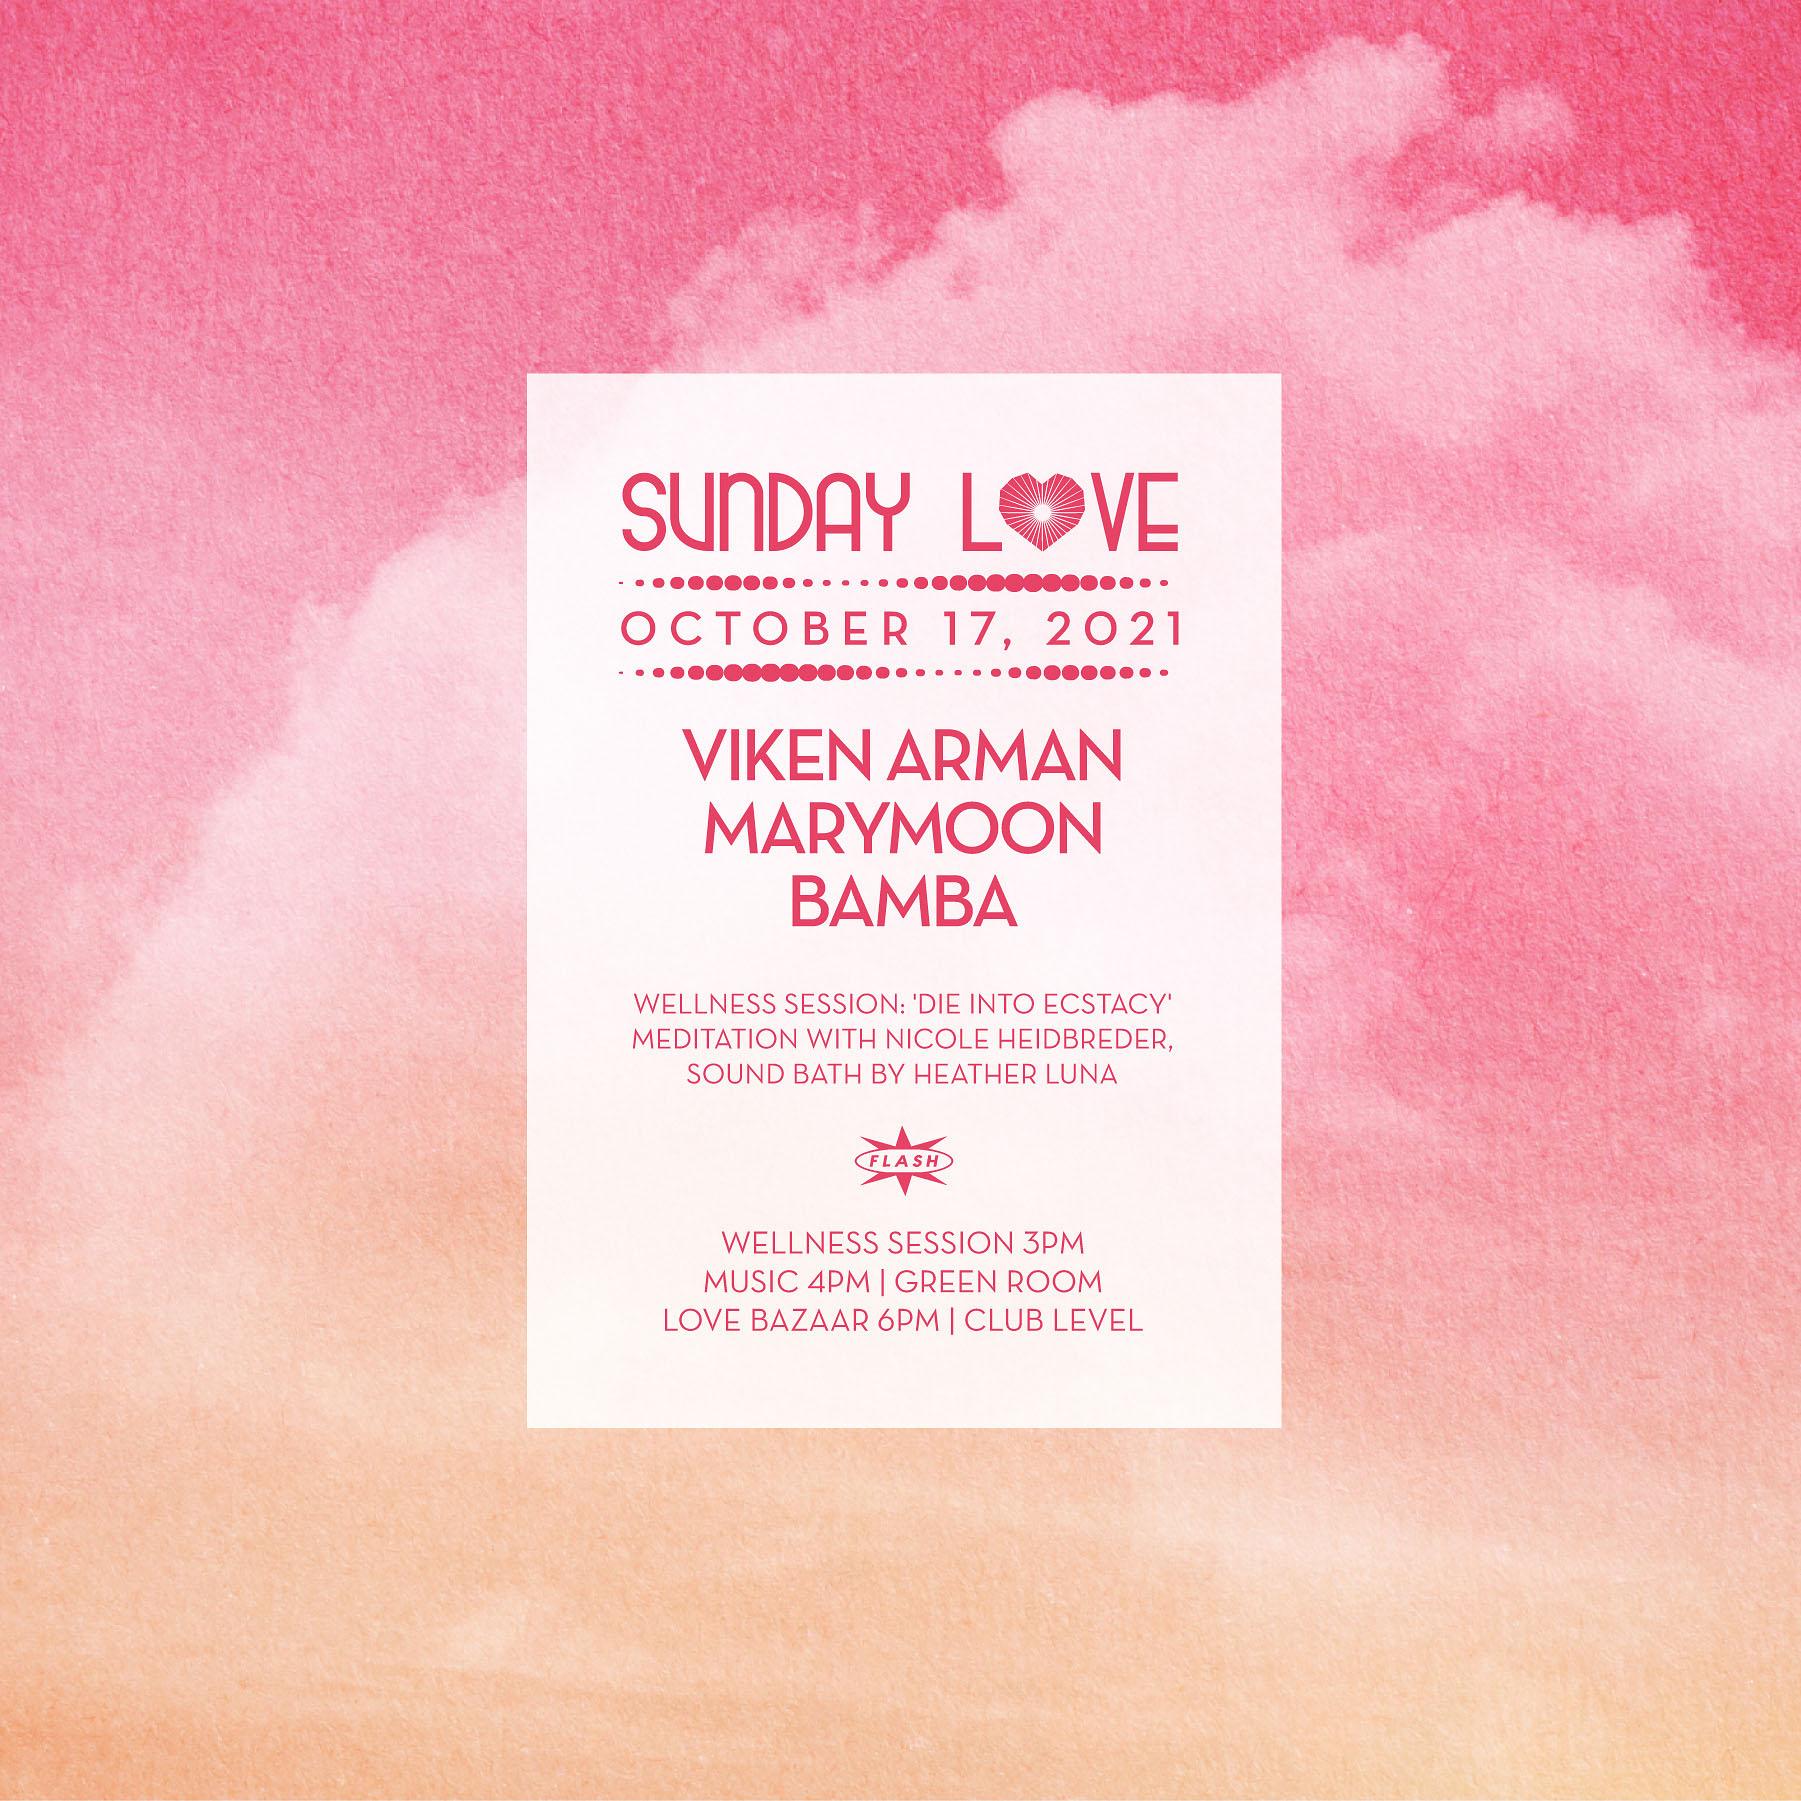 Sunday Love: Viken Arman - Marymoon - Bamba event thumbnail